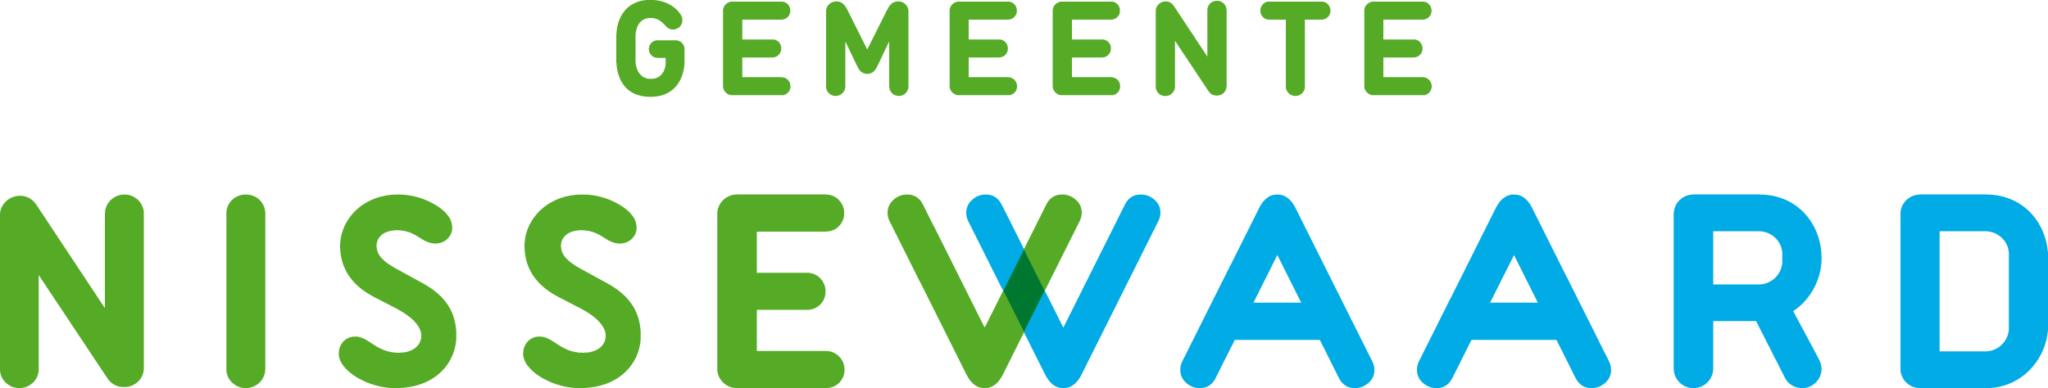 Logo van Nissewaard